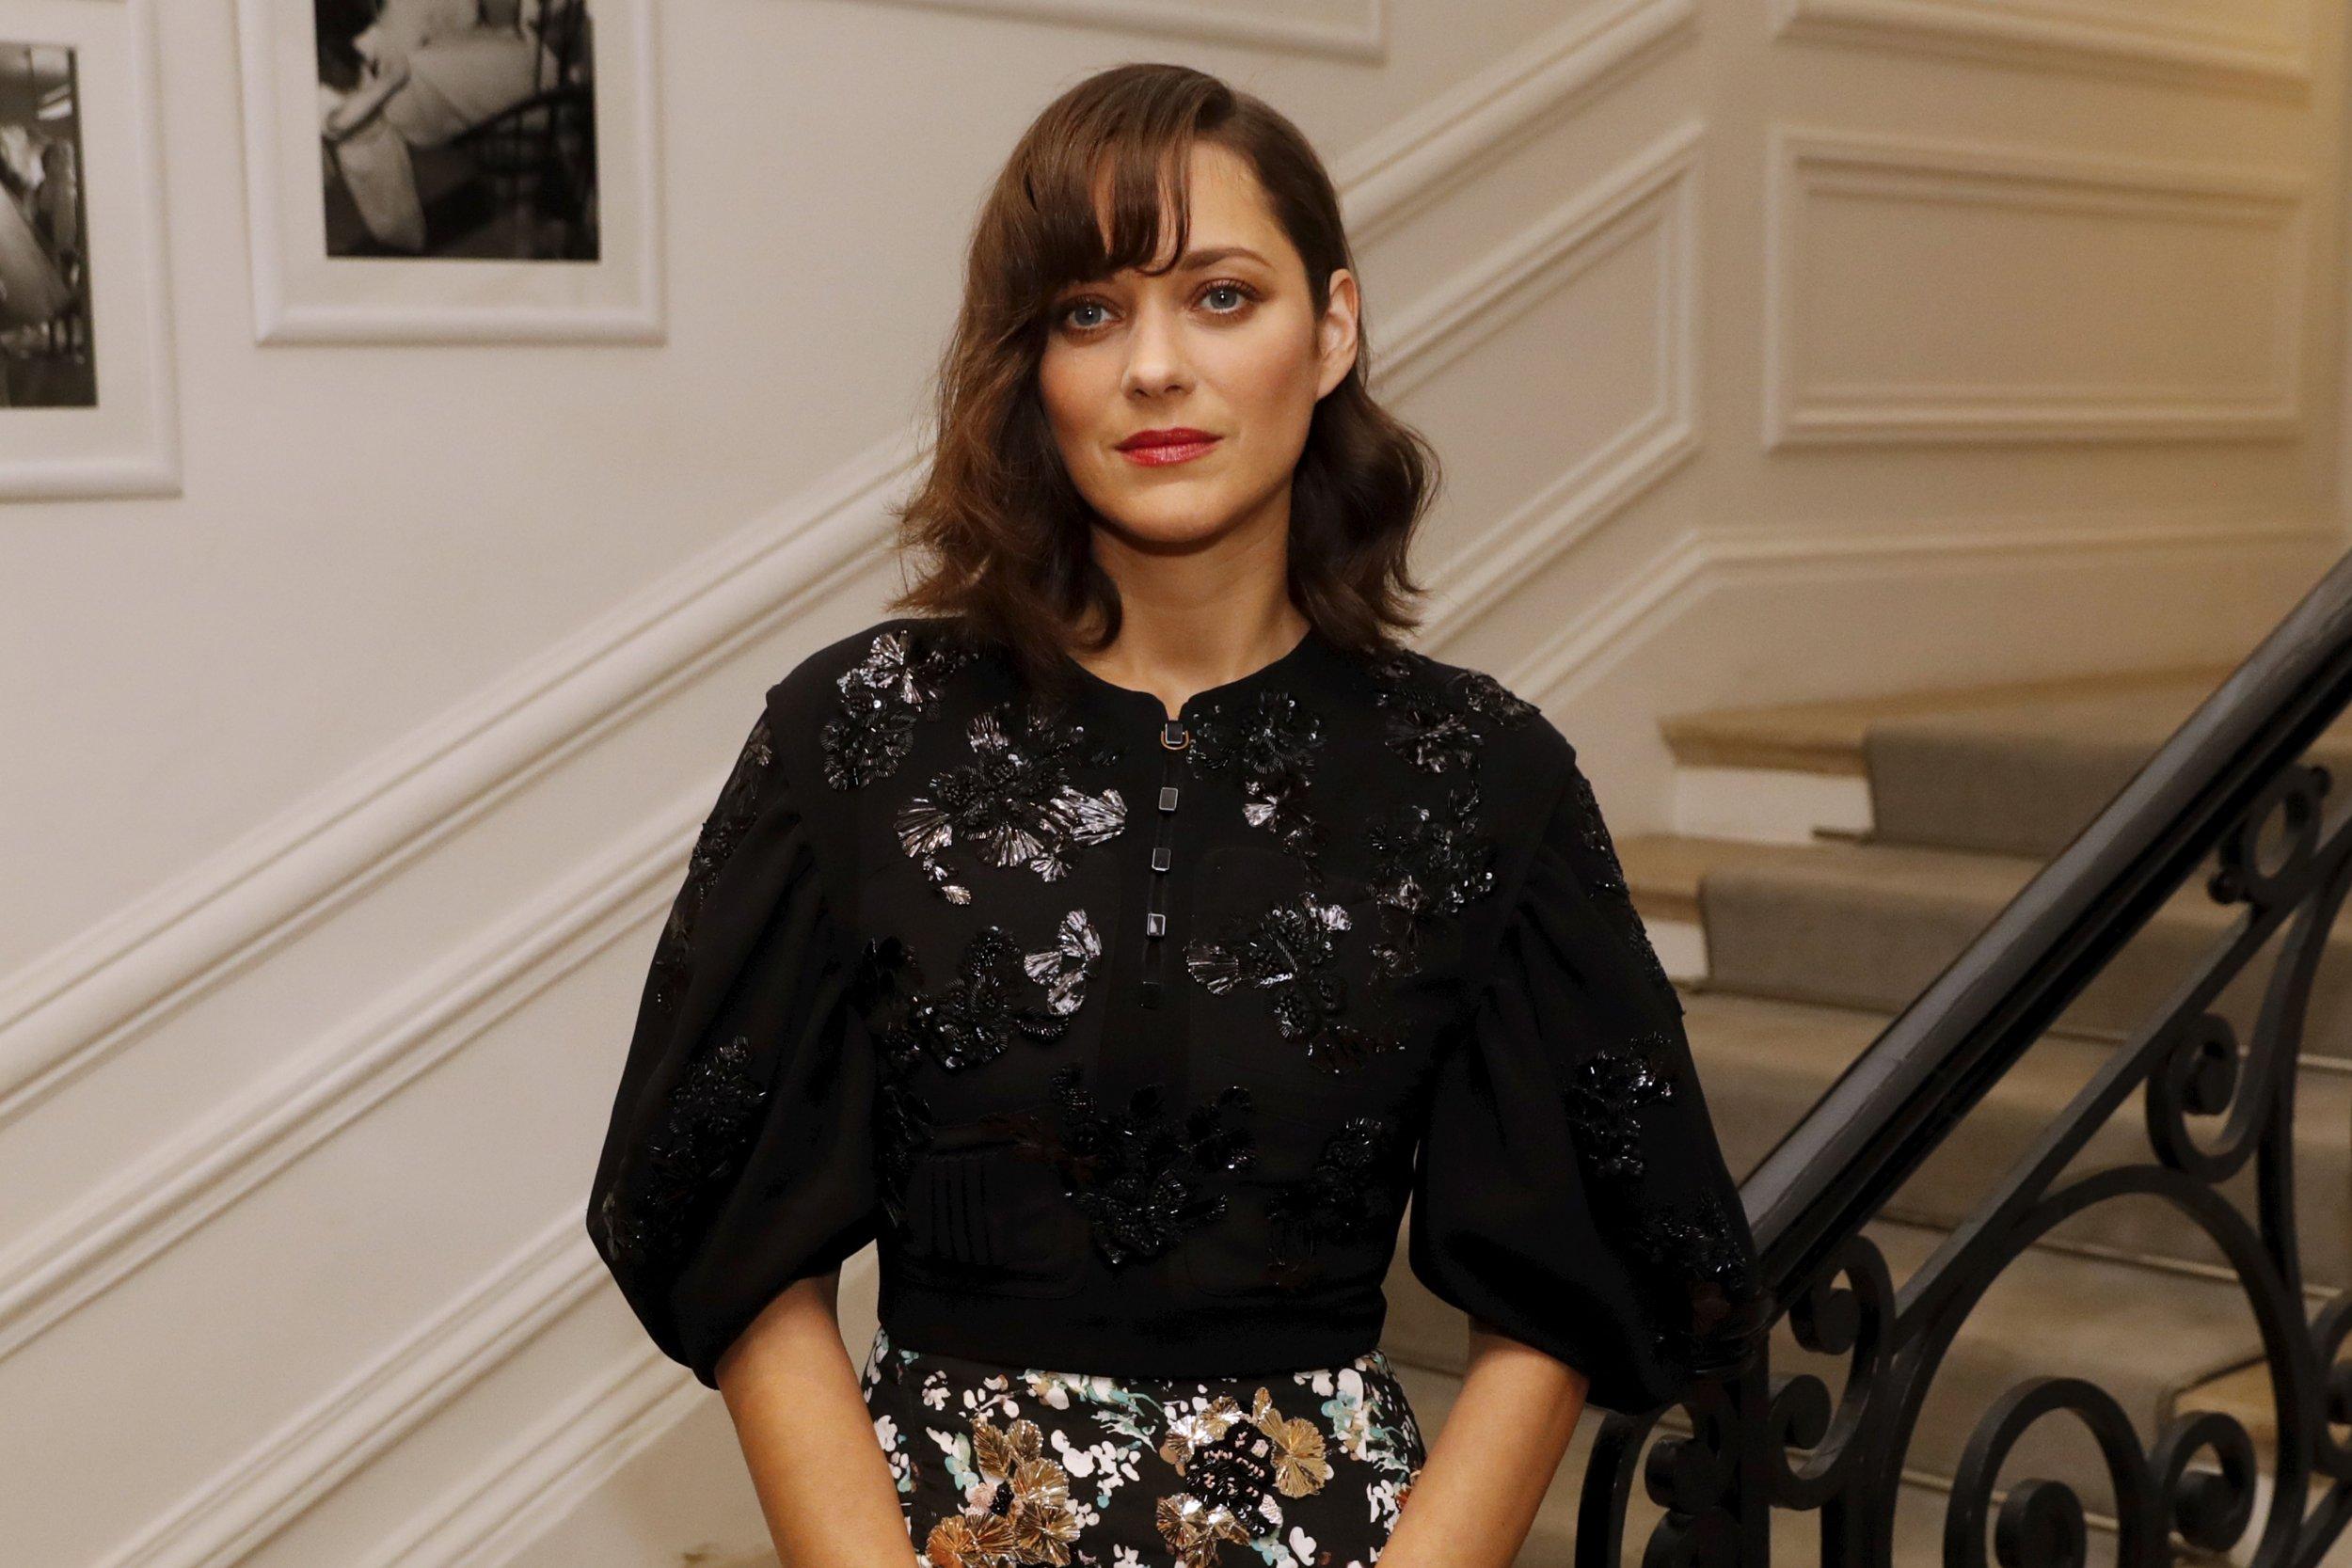 Marion Cotillard in Dior Couture